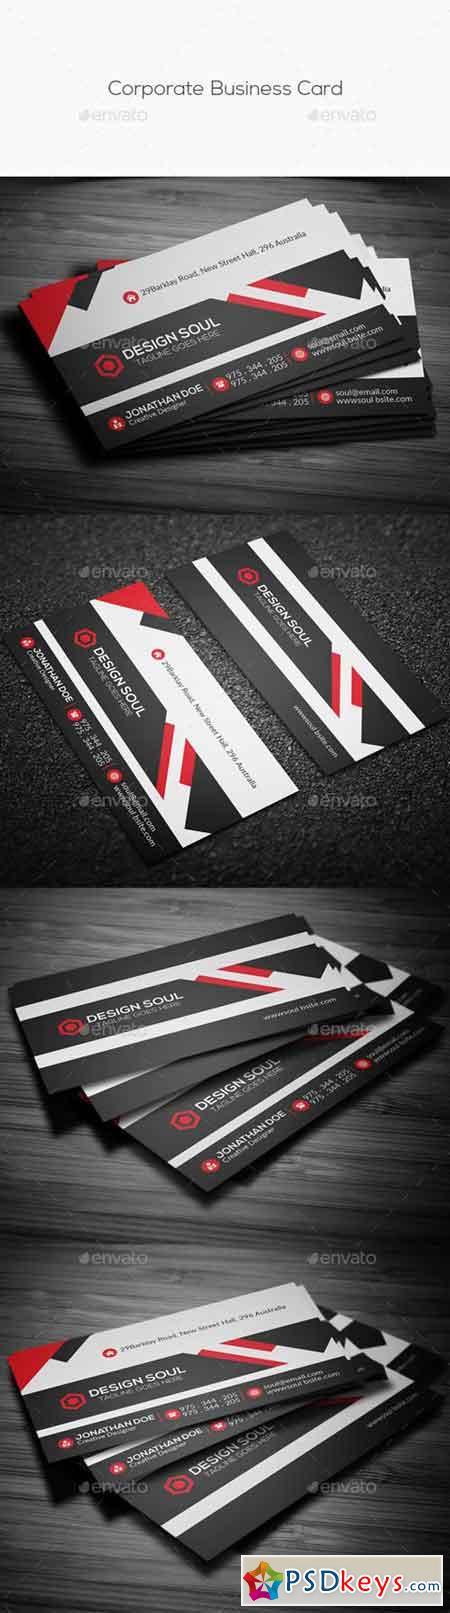 Corporate Business Card 14315028